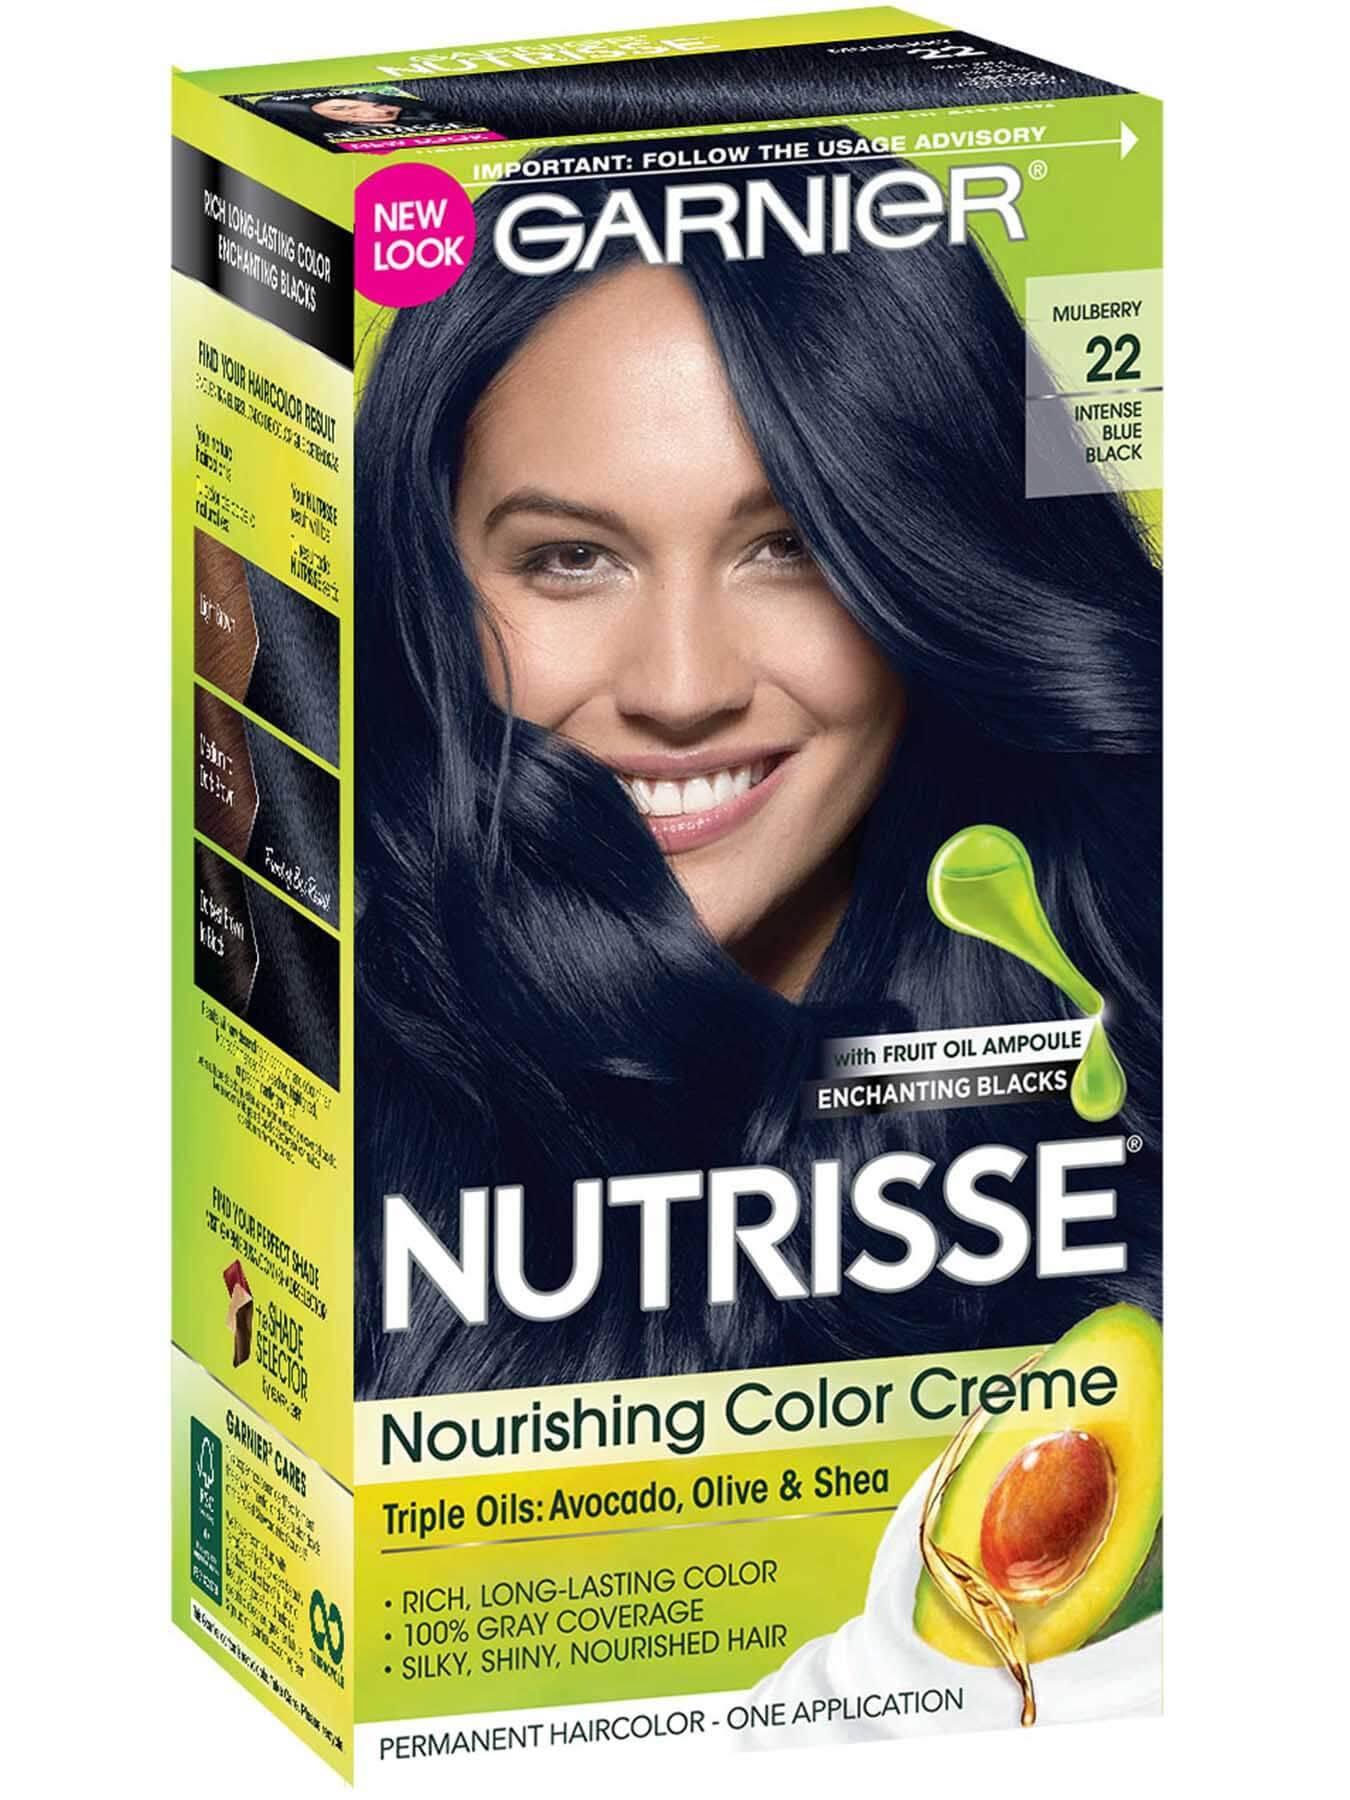 Nourishing Color Creme 22 Intense Blue Black Hair Color Garnier